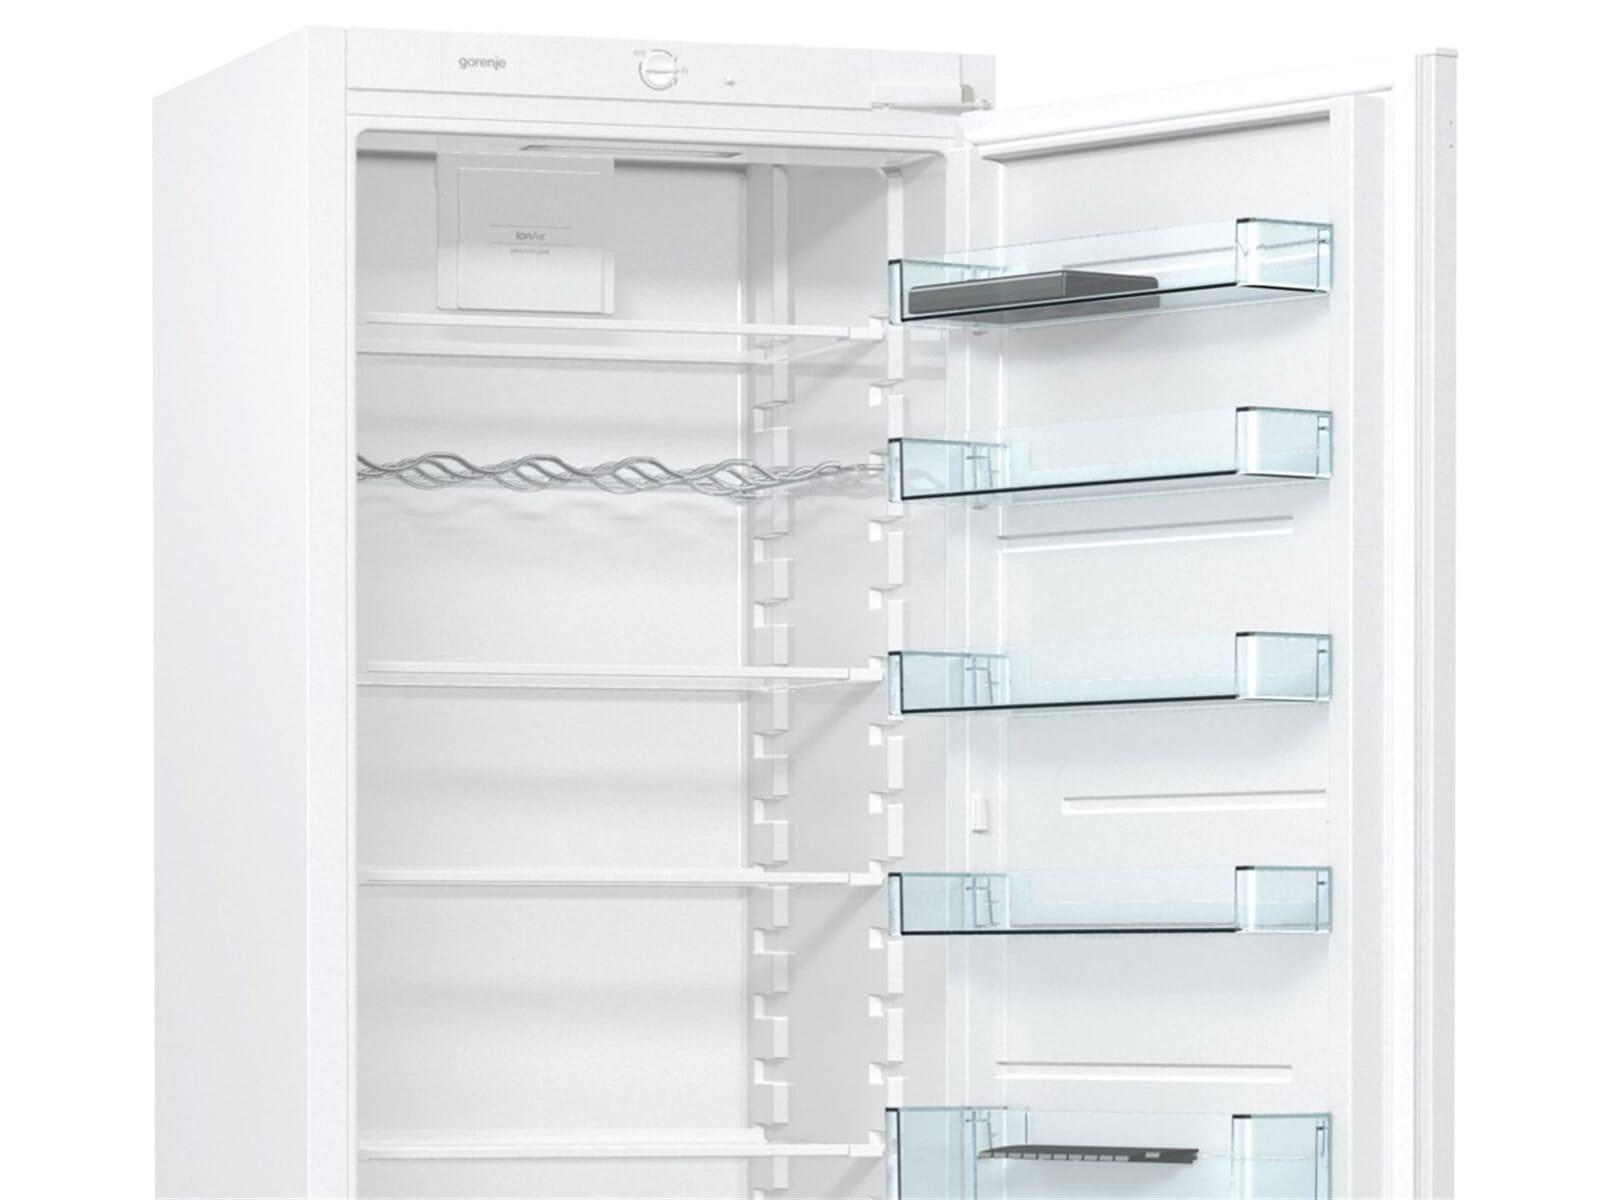 Gorenje RI 4182 E1 Einbaukühlschrank